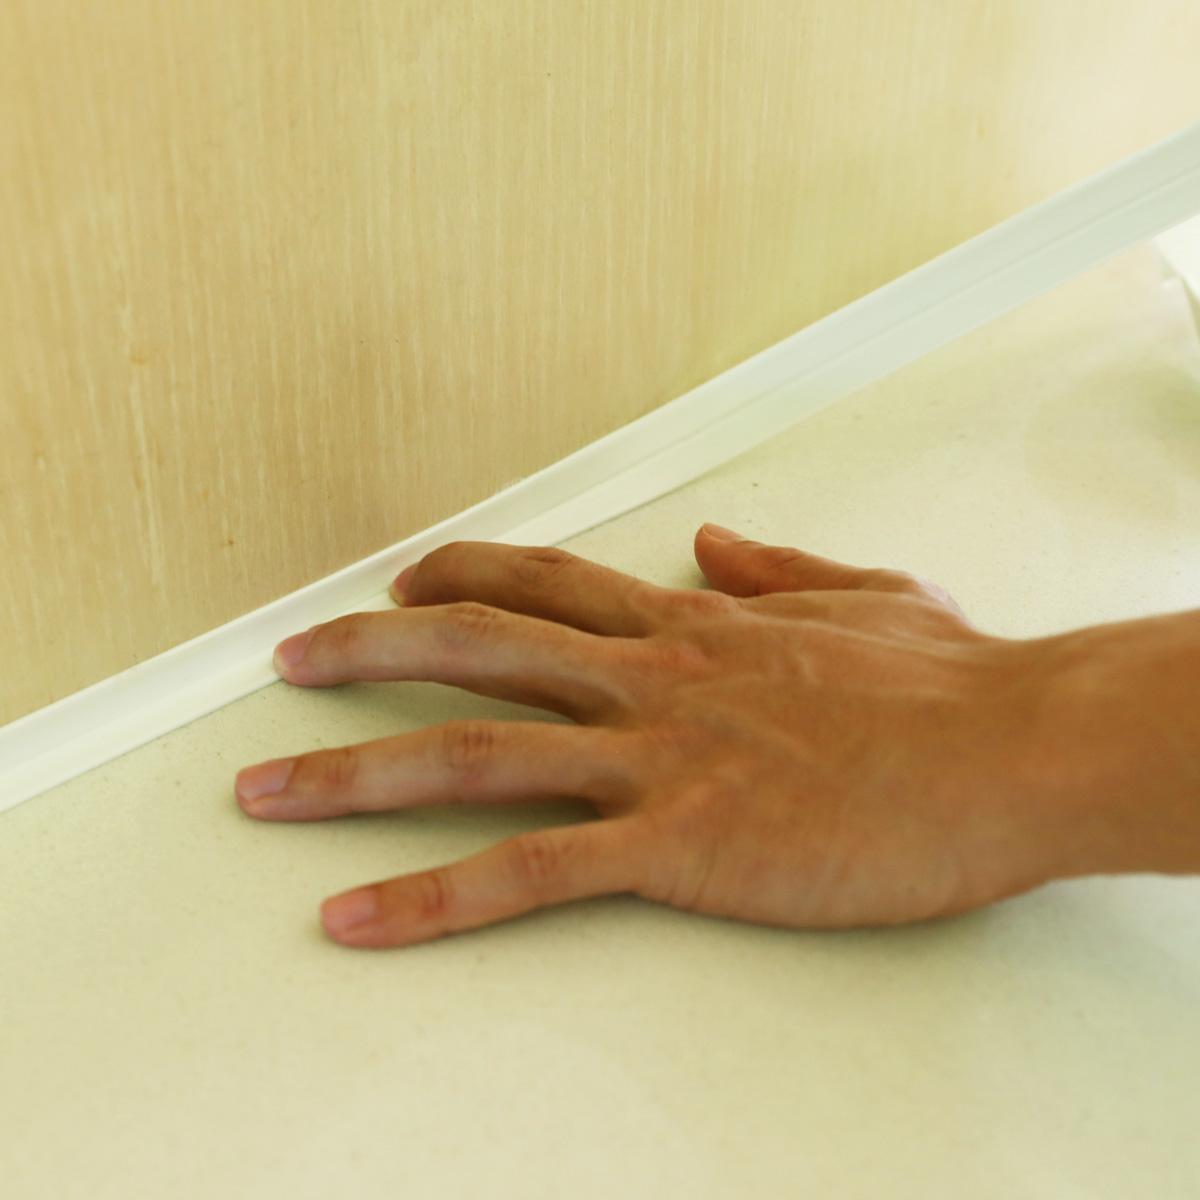 5m fugenband abdichtungsband abdichtband selbstklebend dichtband badewanne ebay. Black Bedroom Furniture Sets. Home Design Ideas